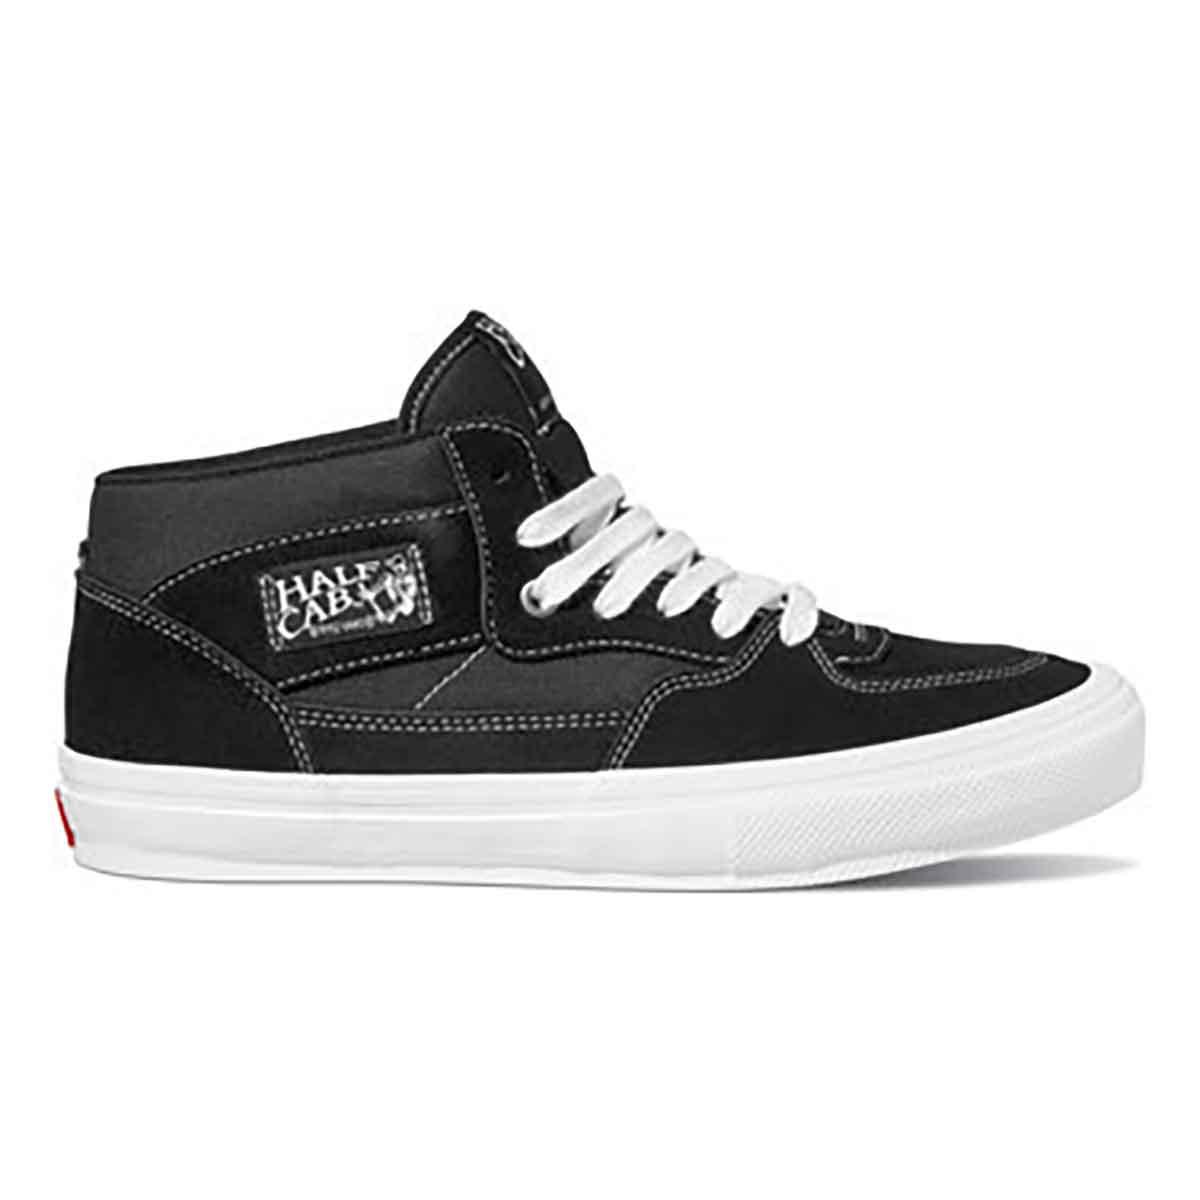 Vans Skate Half Cab Pro Shoes - Black/White